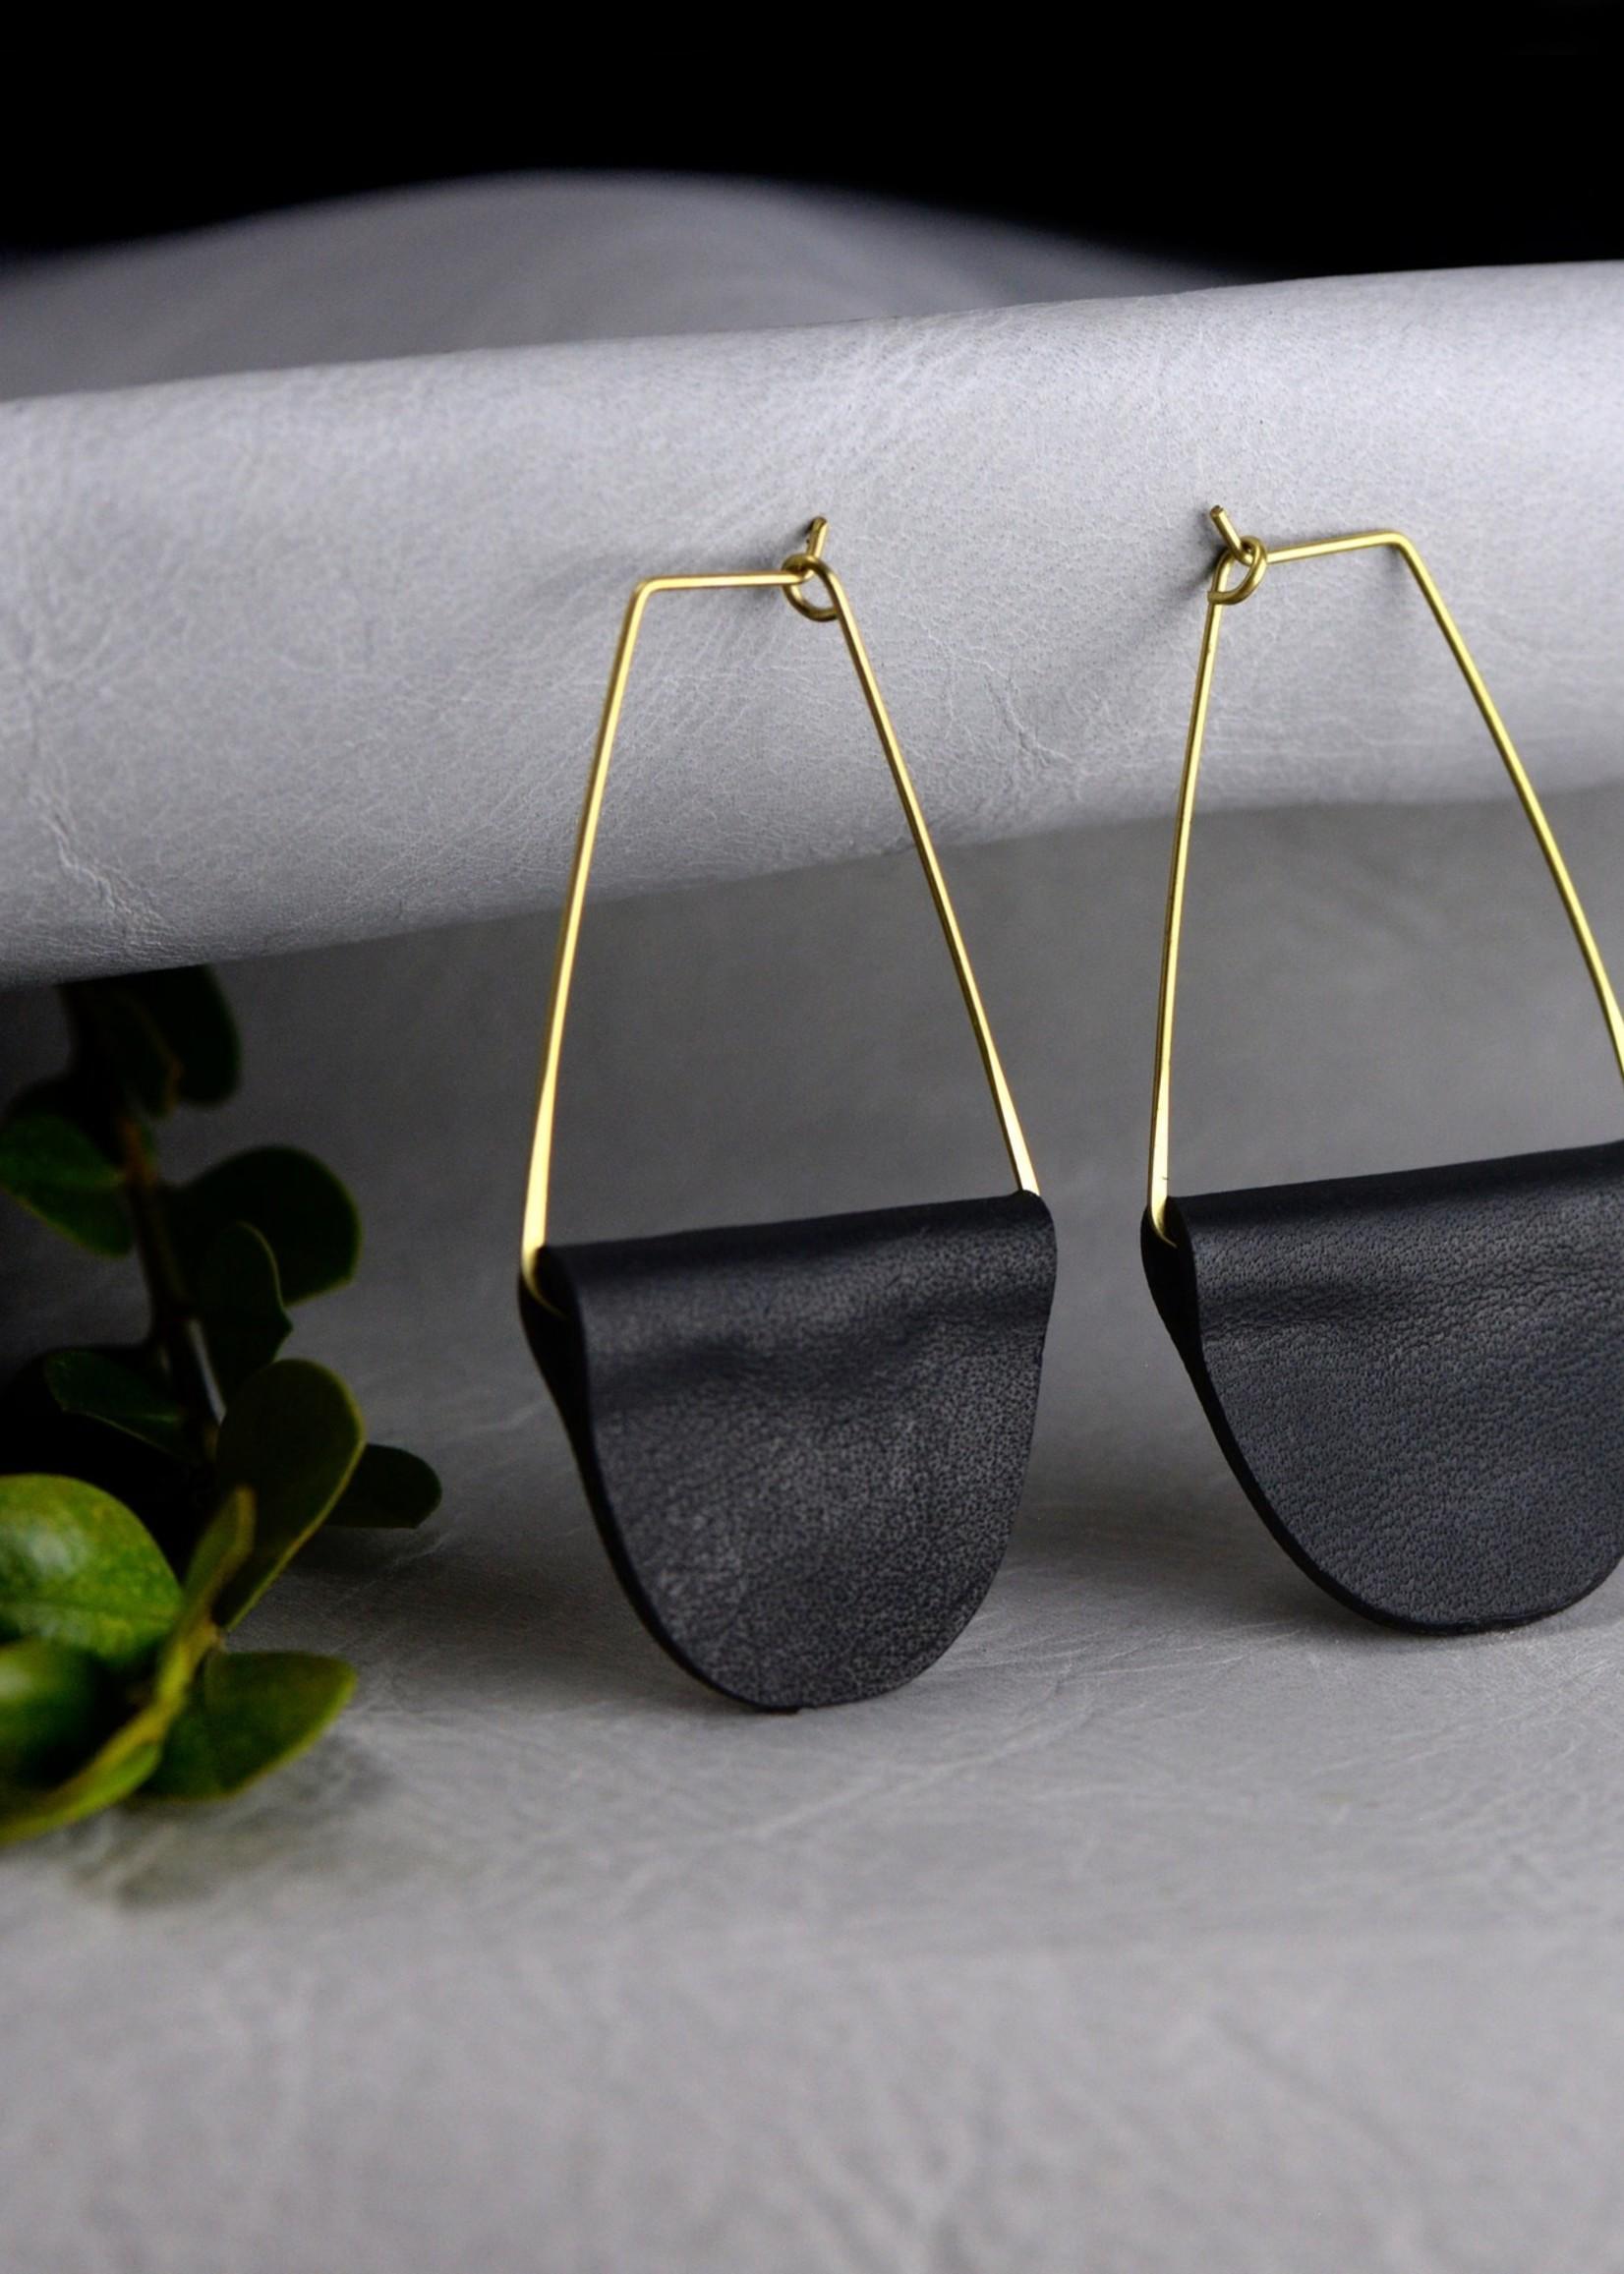 Fashionable Leather Earrings - Black